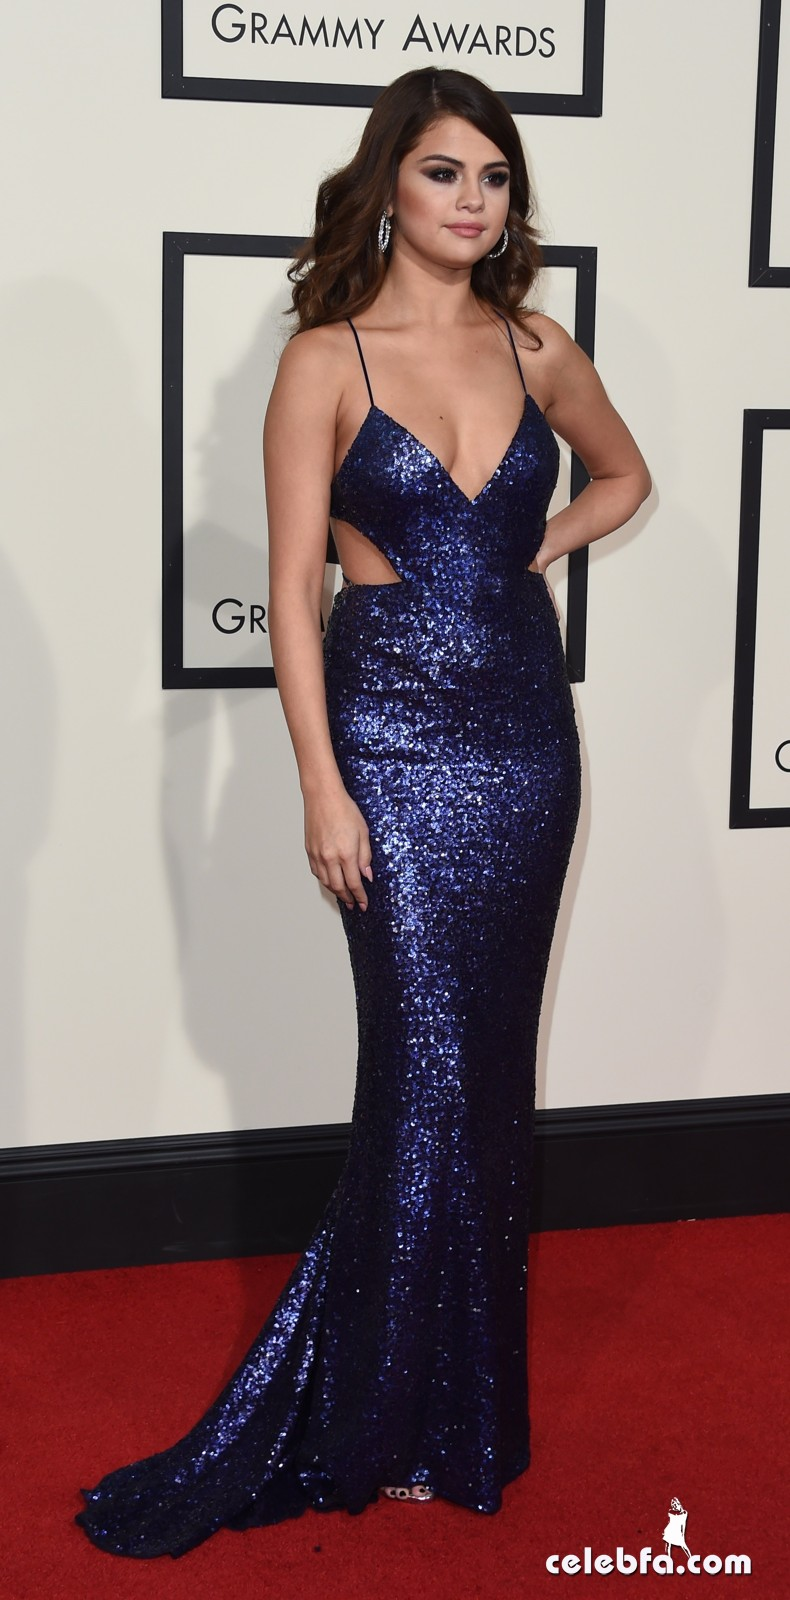 Selena Gomez - The 58th Annual GRAMMY Awards (3)